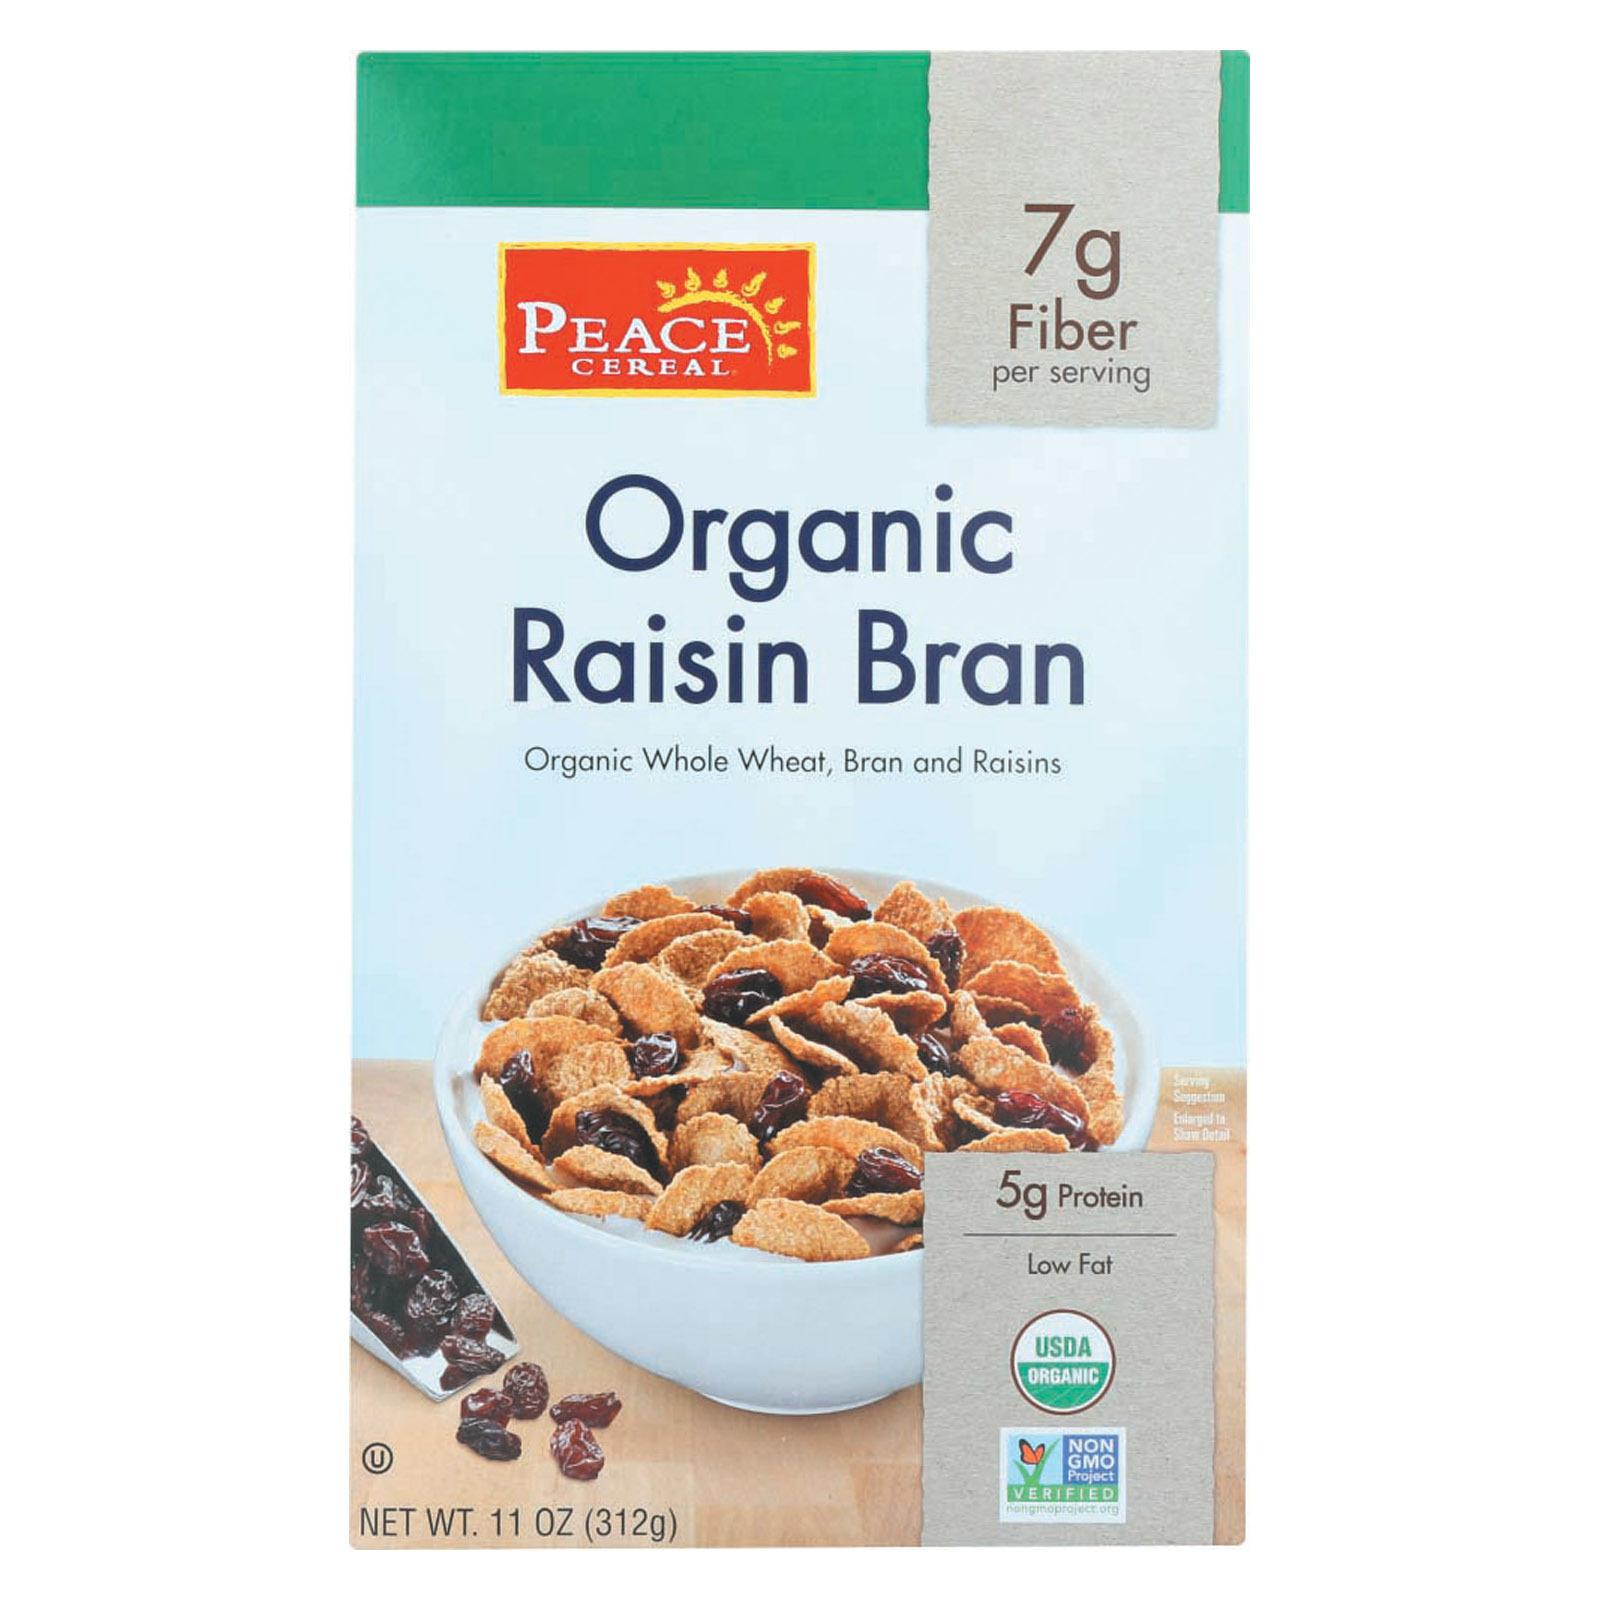 Peace Cereals Organic Raisin Bran - Case of 6 - 11 oz.